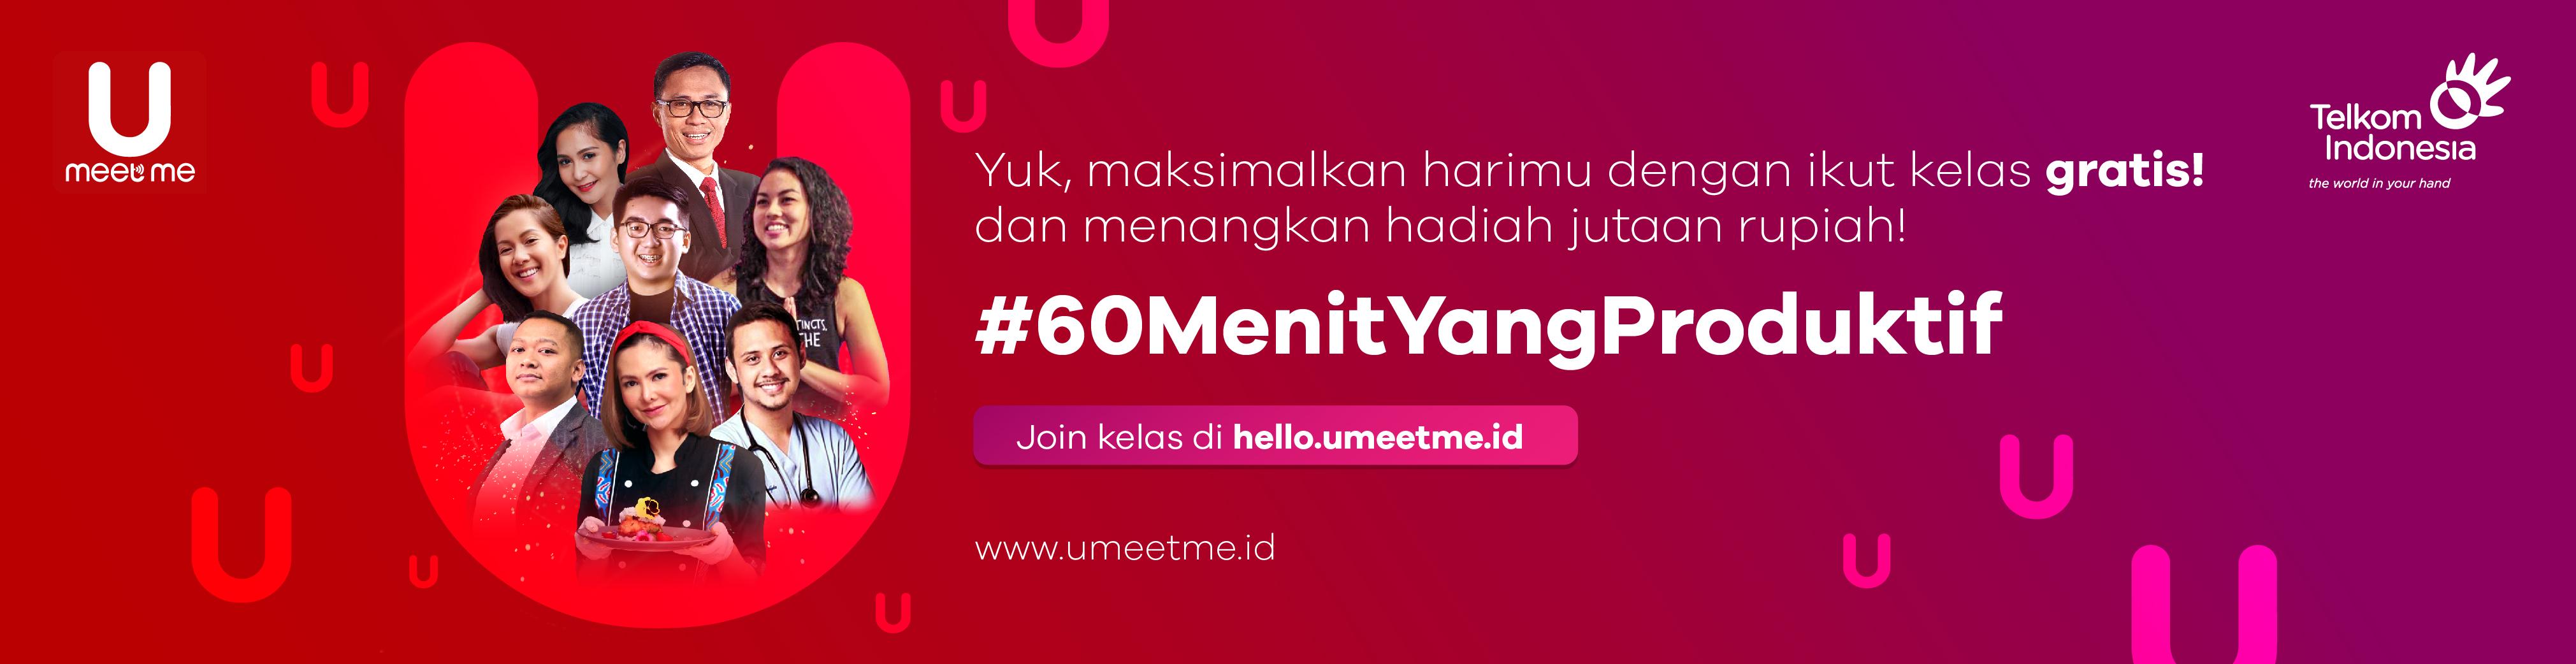 UMeetMe_60Menit_Banner (970x250)